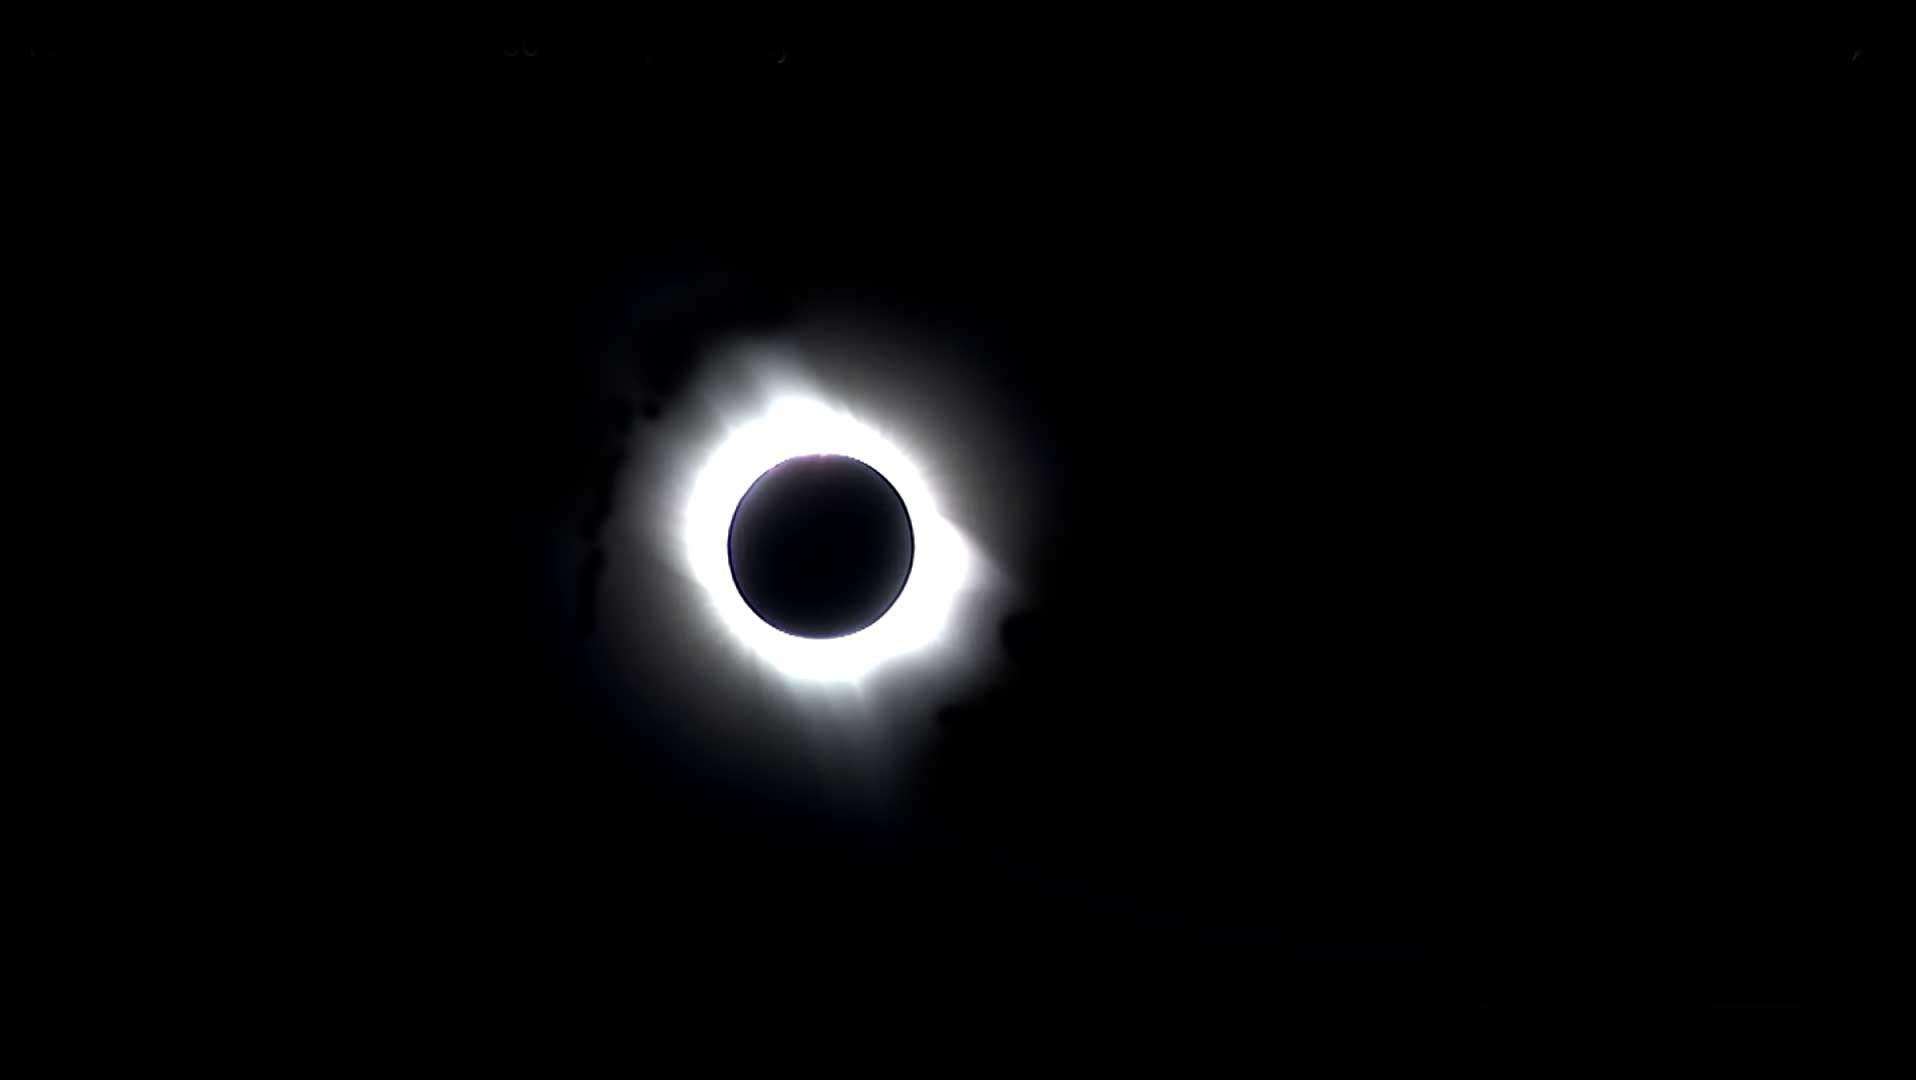 Güneş Tutulması Nedir, Nasıl Olur??fit=thumb&w=418&h=152&q=80